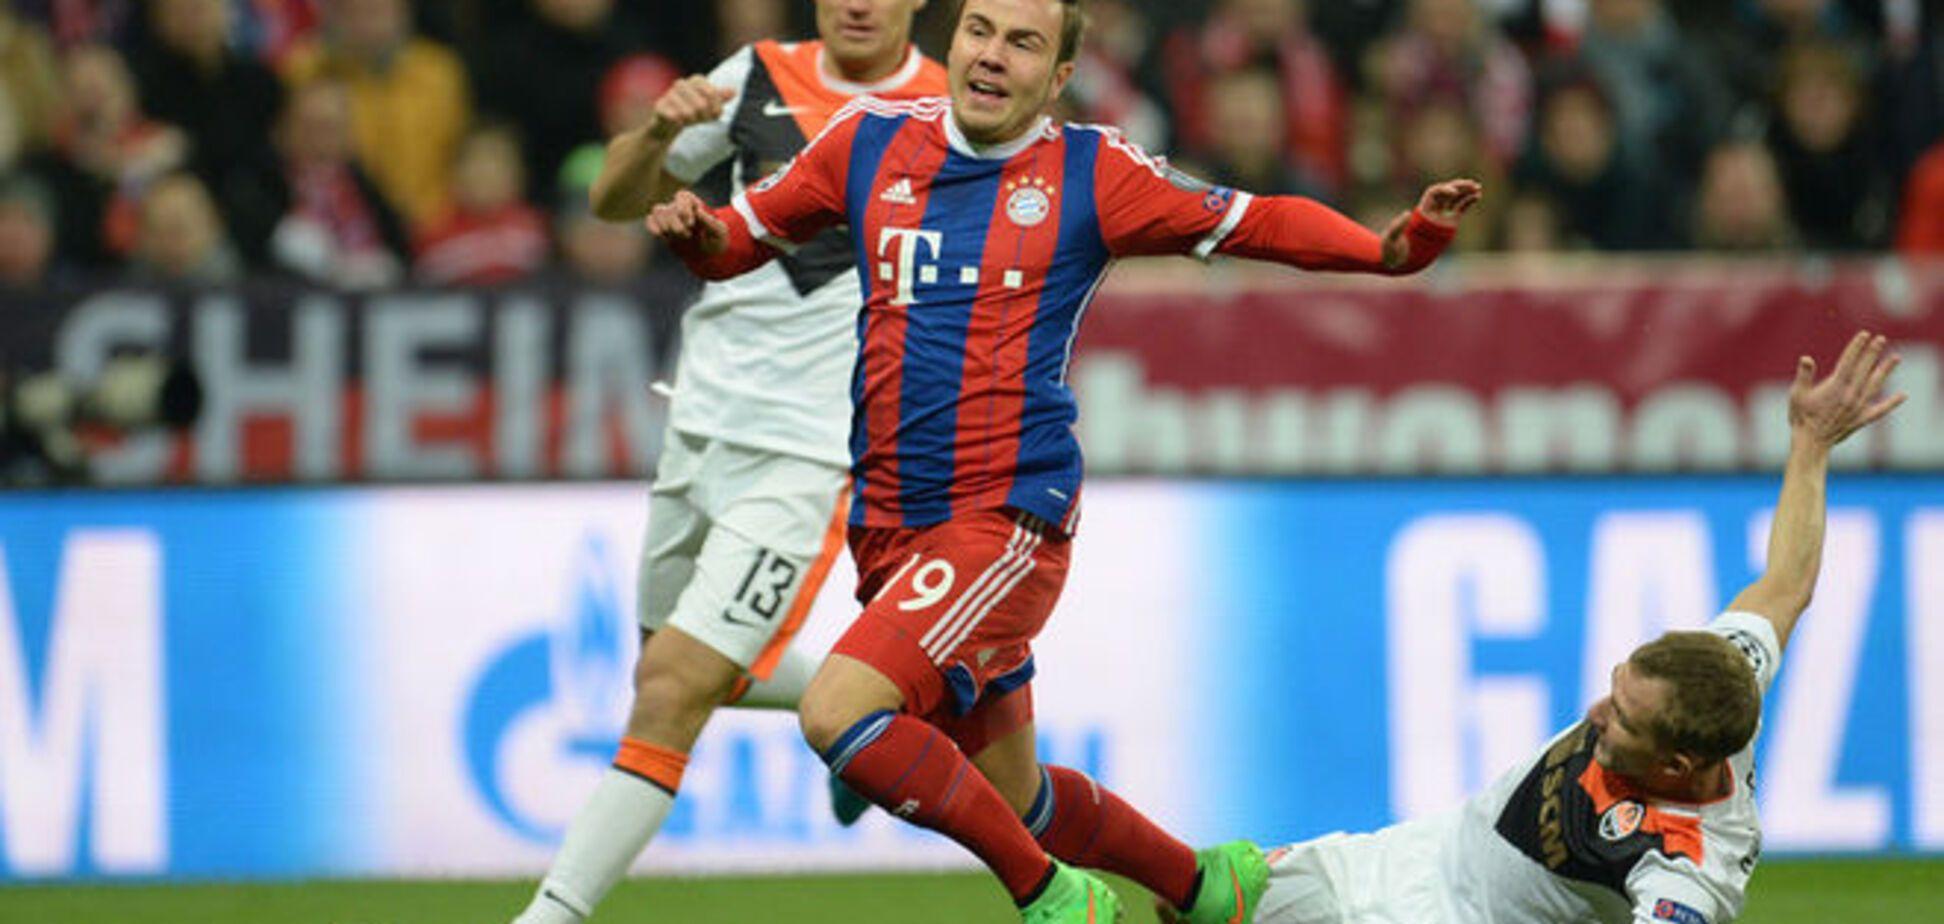 Бавария - Шахтер - 7-0: смотреть видео голов